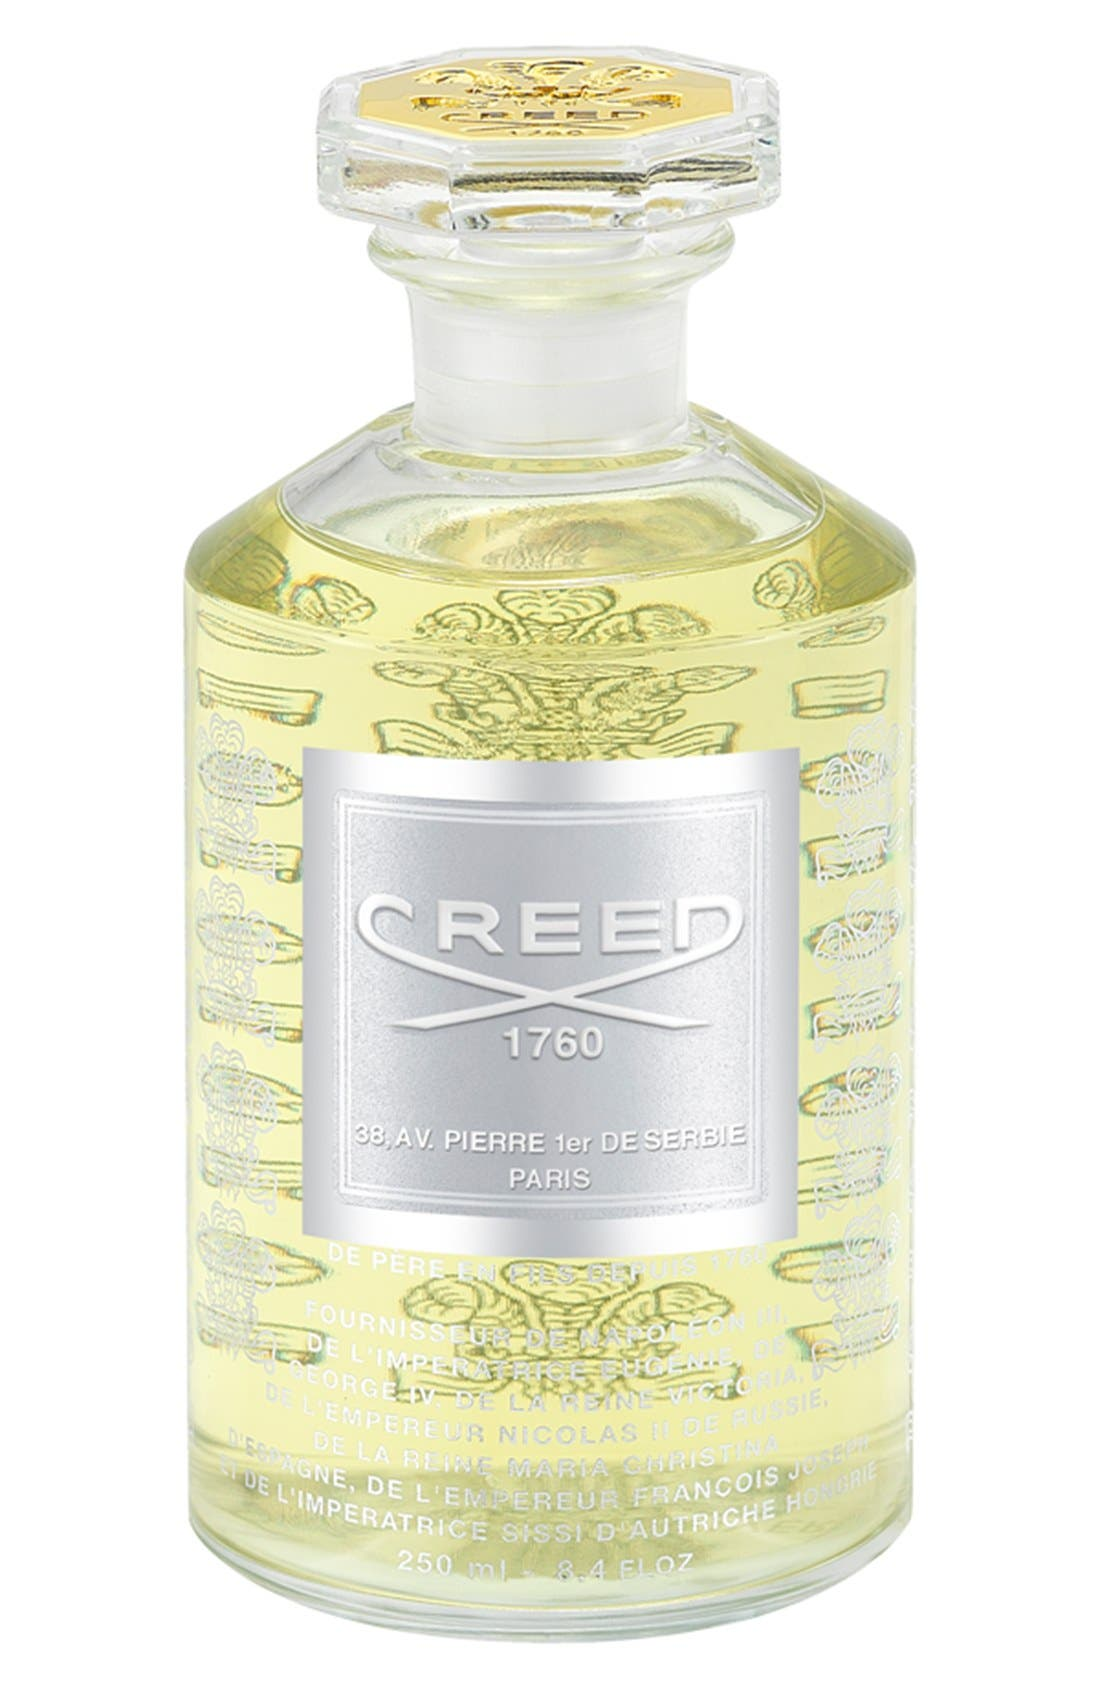 Creed 'Original Vetiver' Fragrance (8.4 oz.)